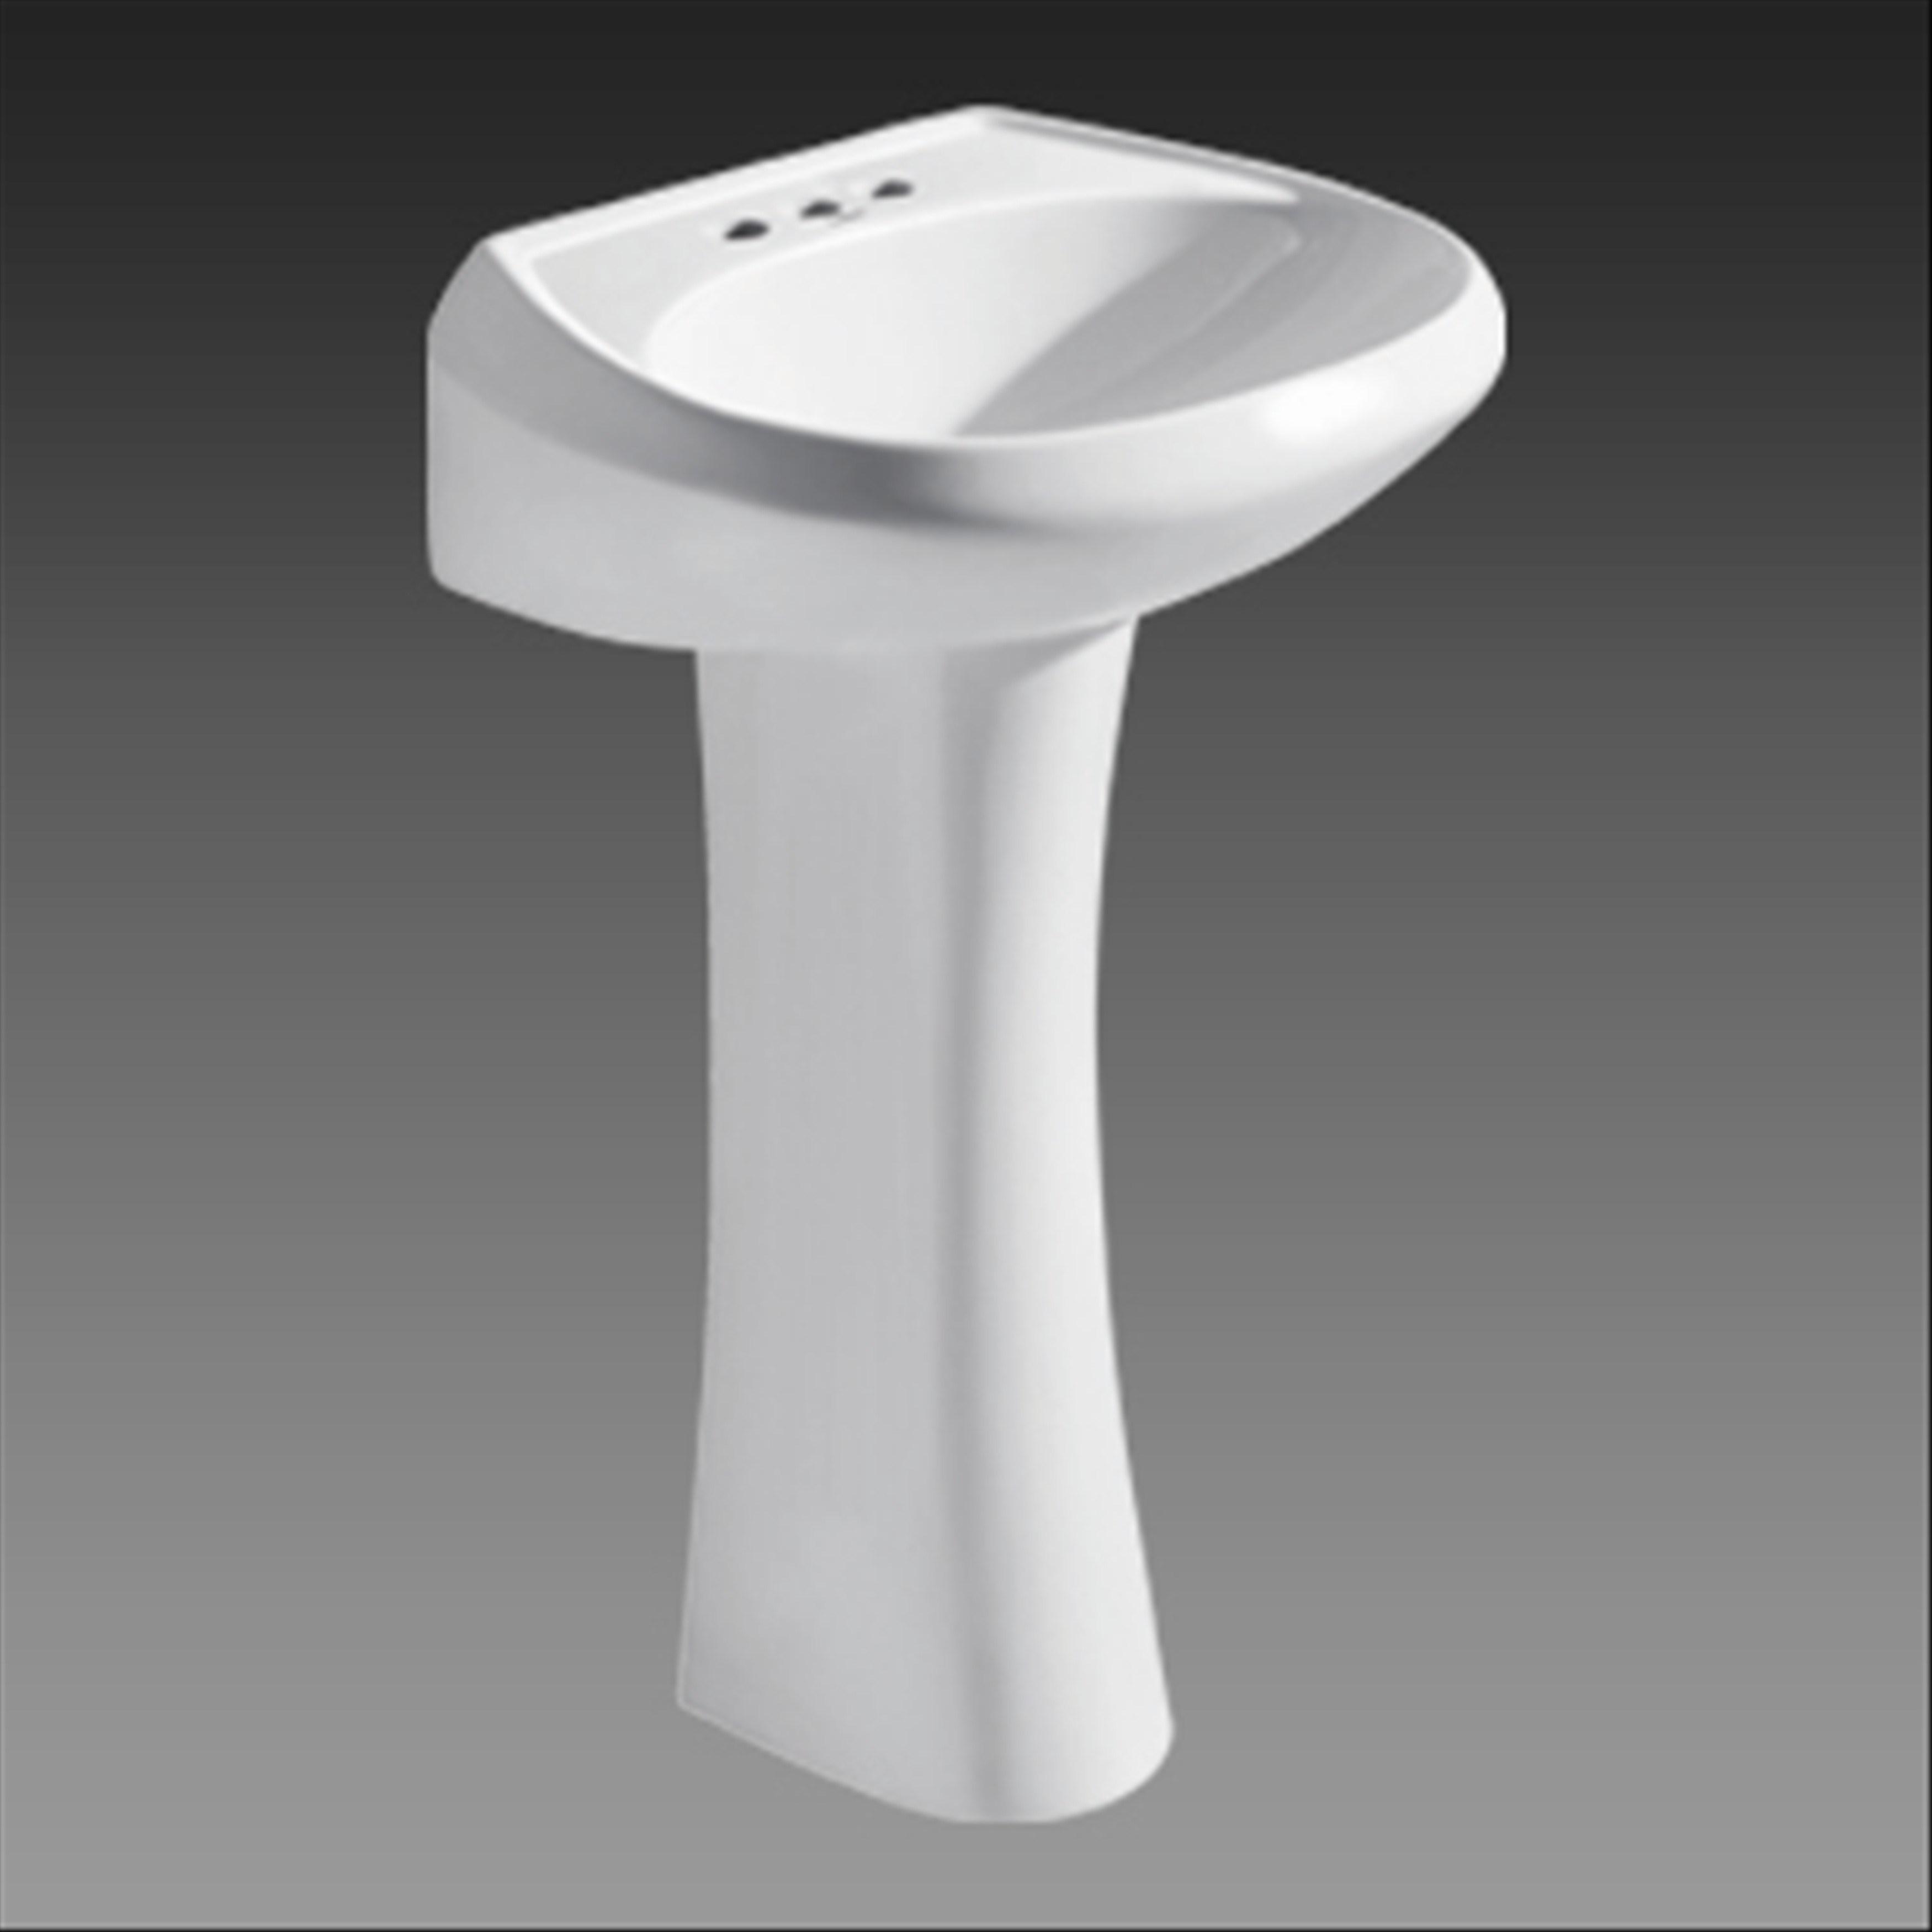 Pedestal Basin / Ceramic Wash Basin (HTM3002) - China Basin, Pedestal ...